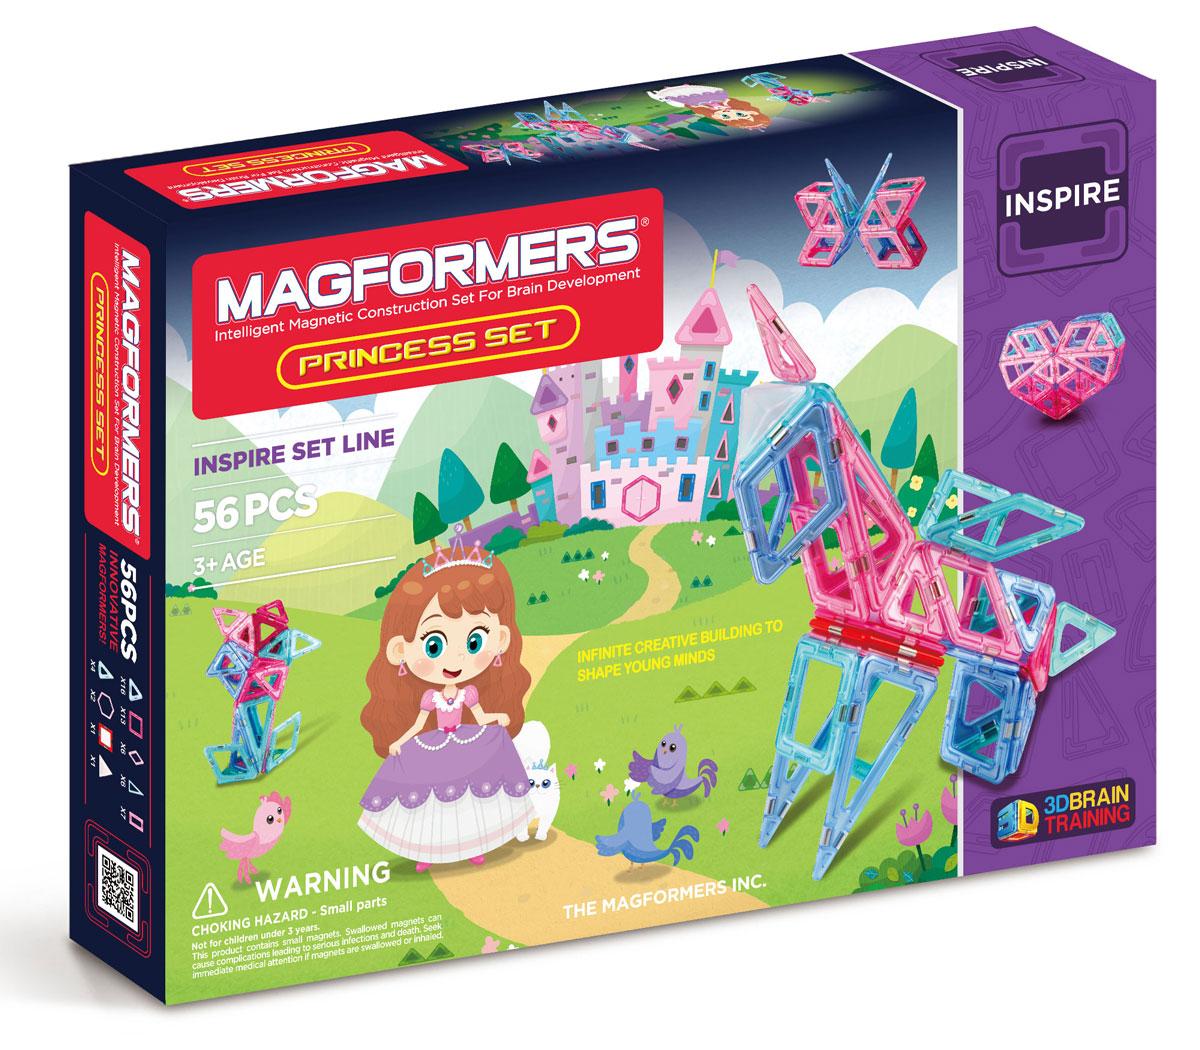 Magformers Магнитный конструктор Princess Set магнитный конструктор magformers space treveller set 35 элементов 703007